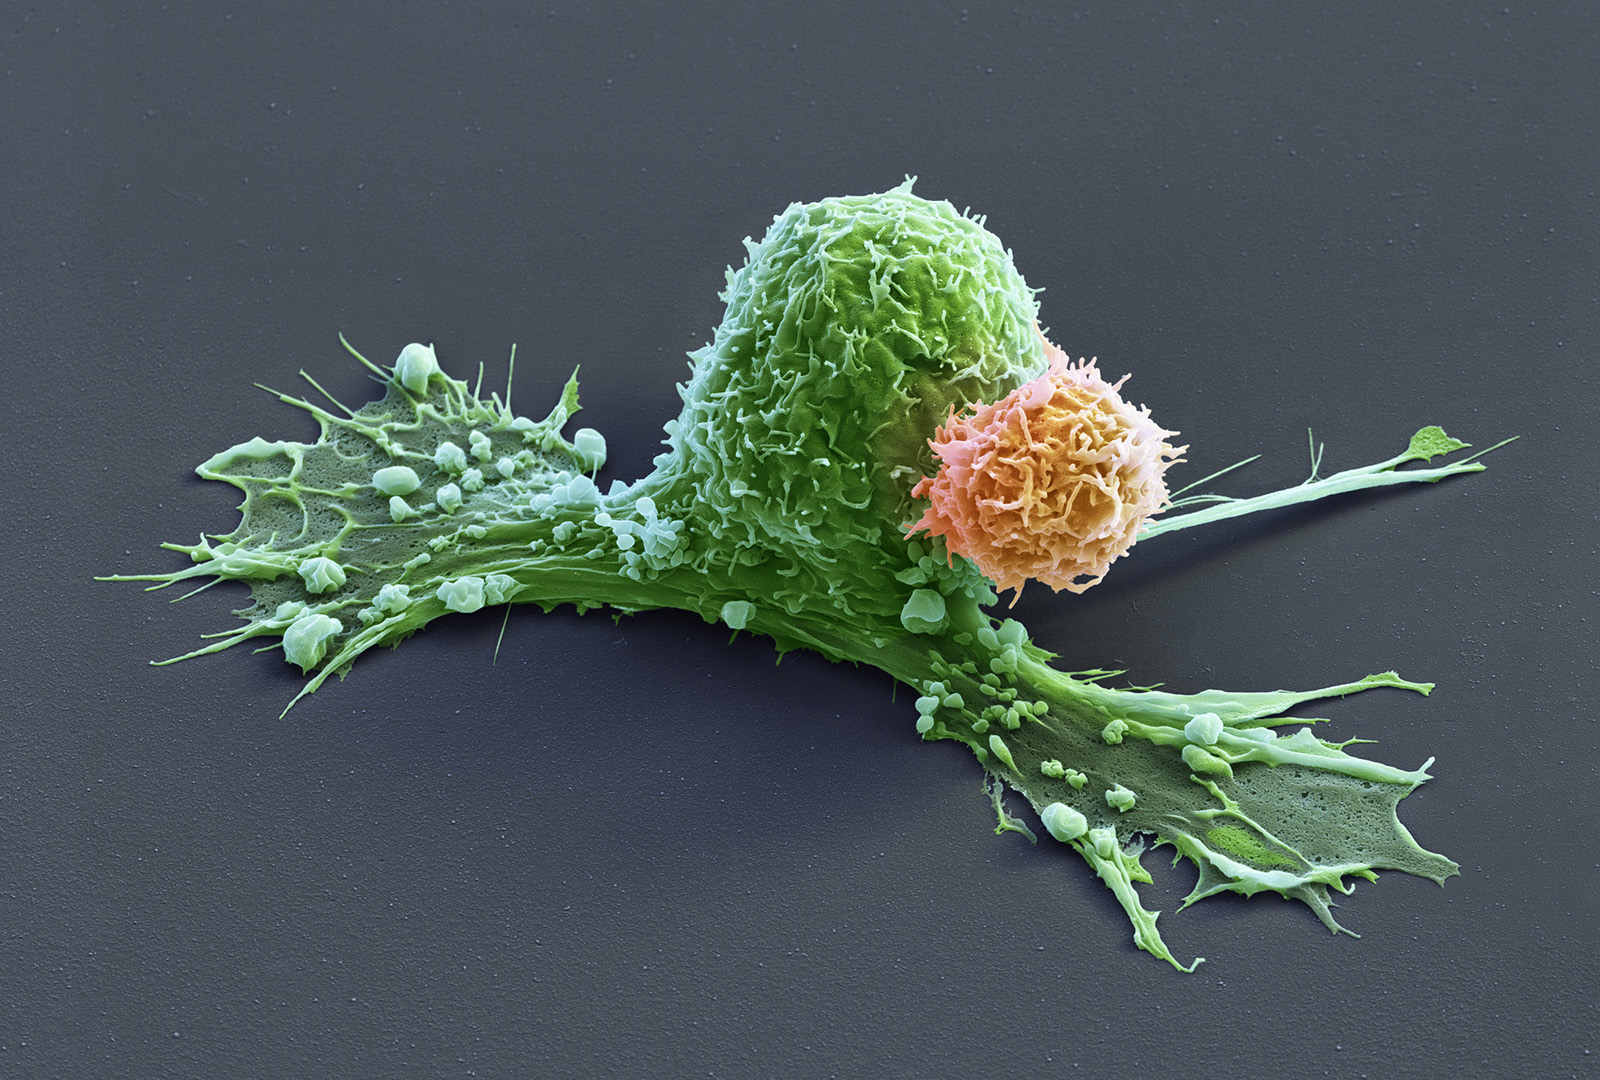 Mammakarzinom-Zellen mit CAR-Zellen, 3600:1